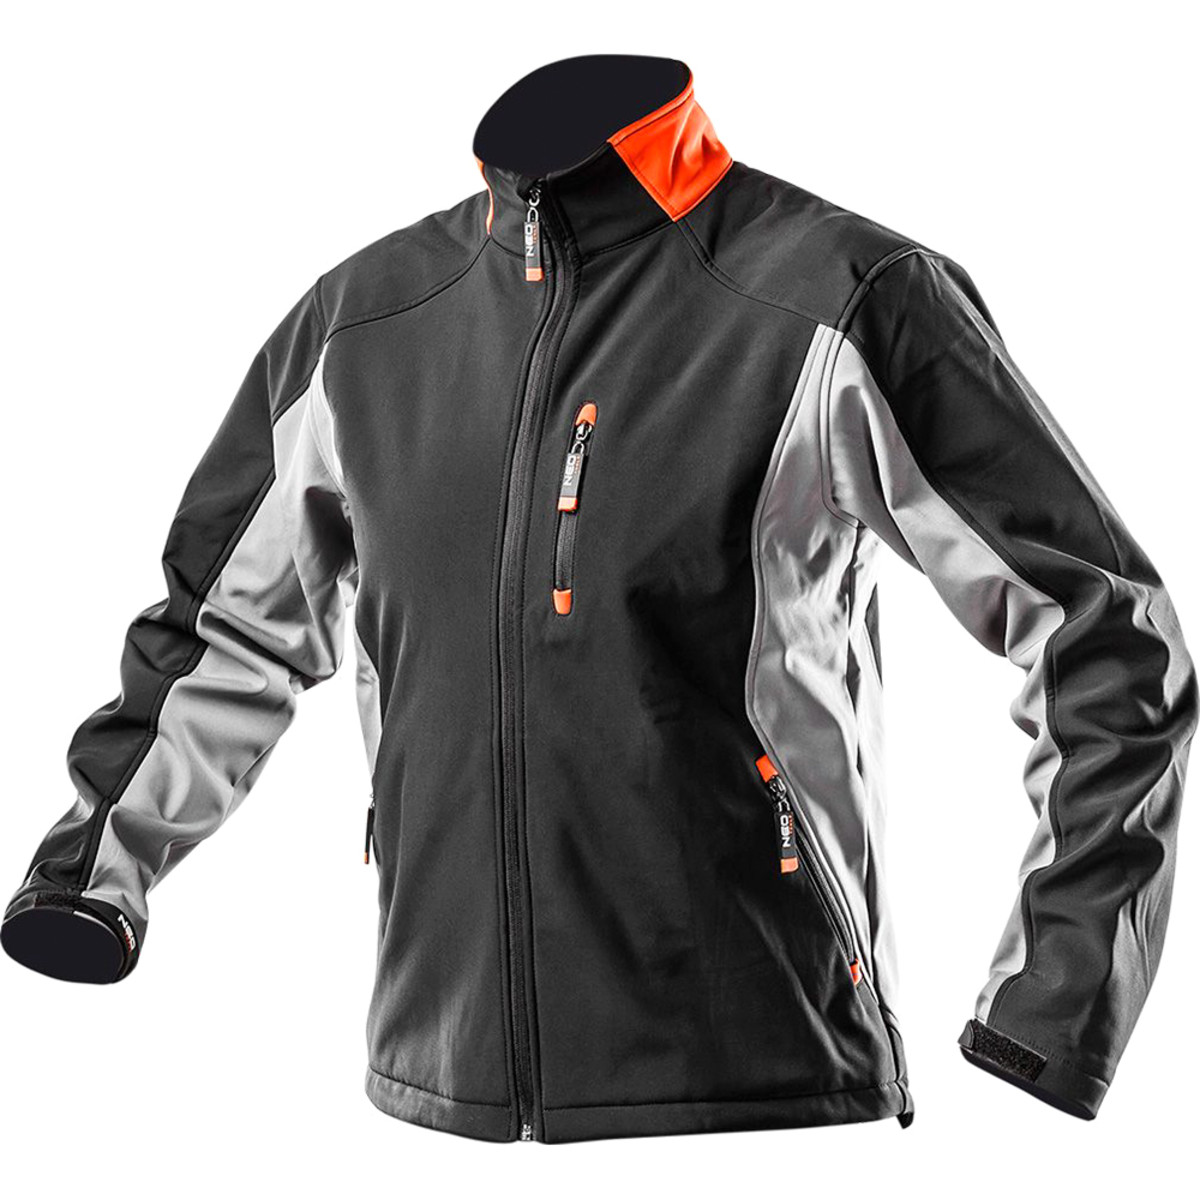 Куртка водо- и ветронепроницаемая Neo softshell размер XXL/58